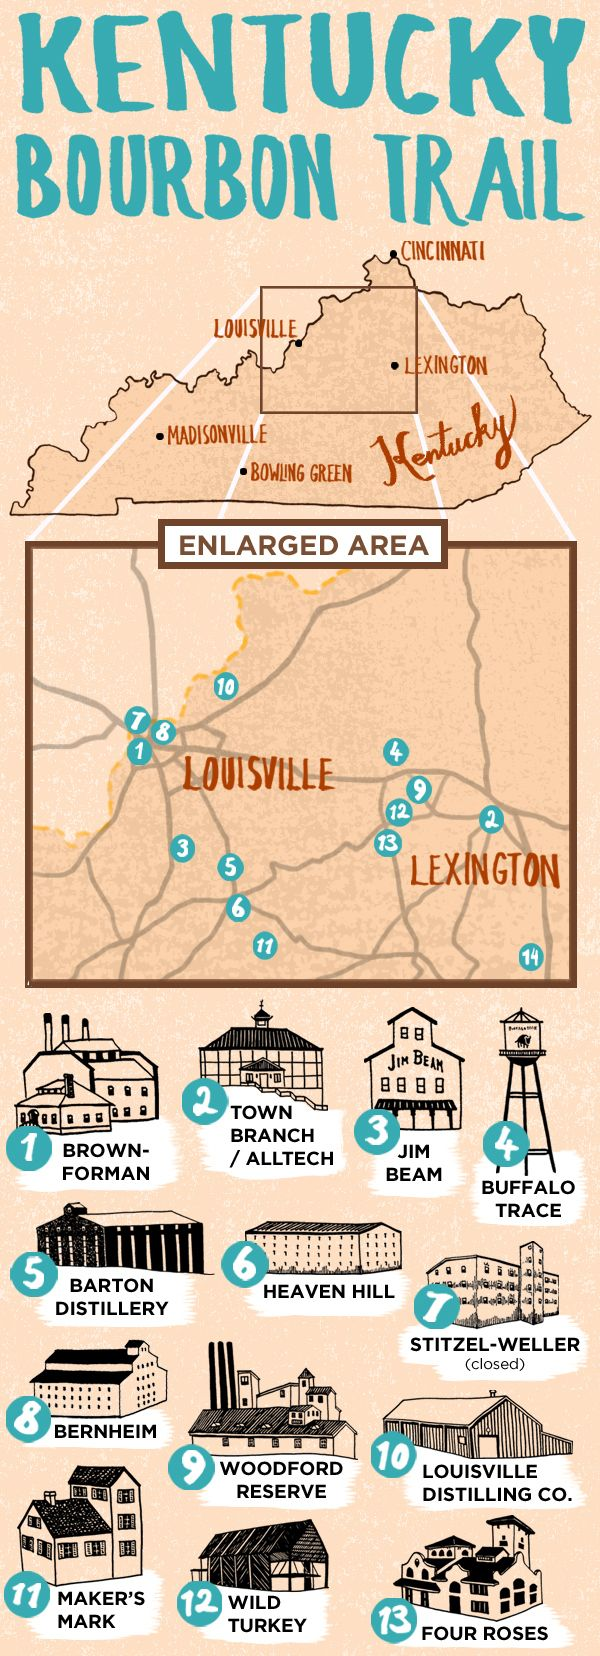 Charlotte Gudmundsson - Map of Kentucky Bourbon Trail